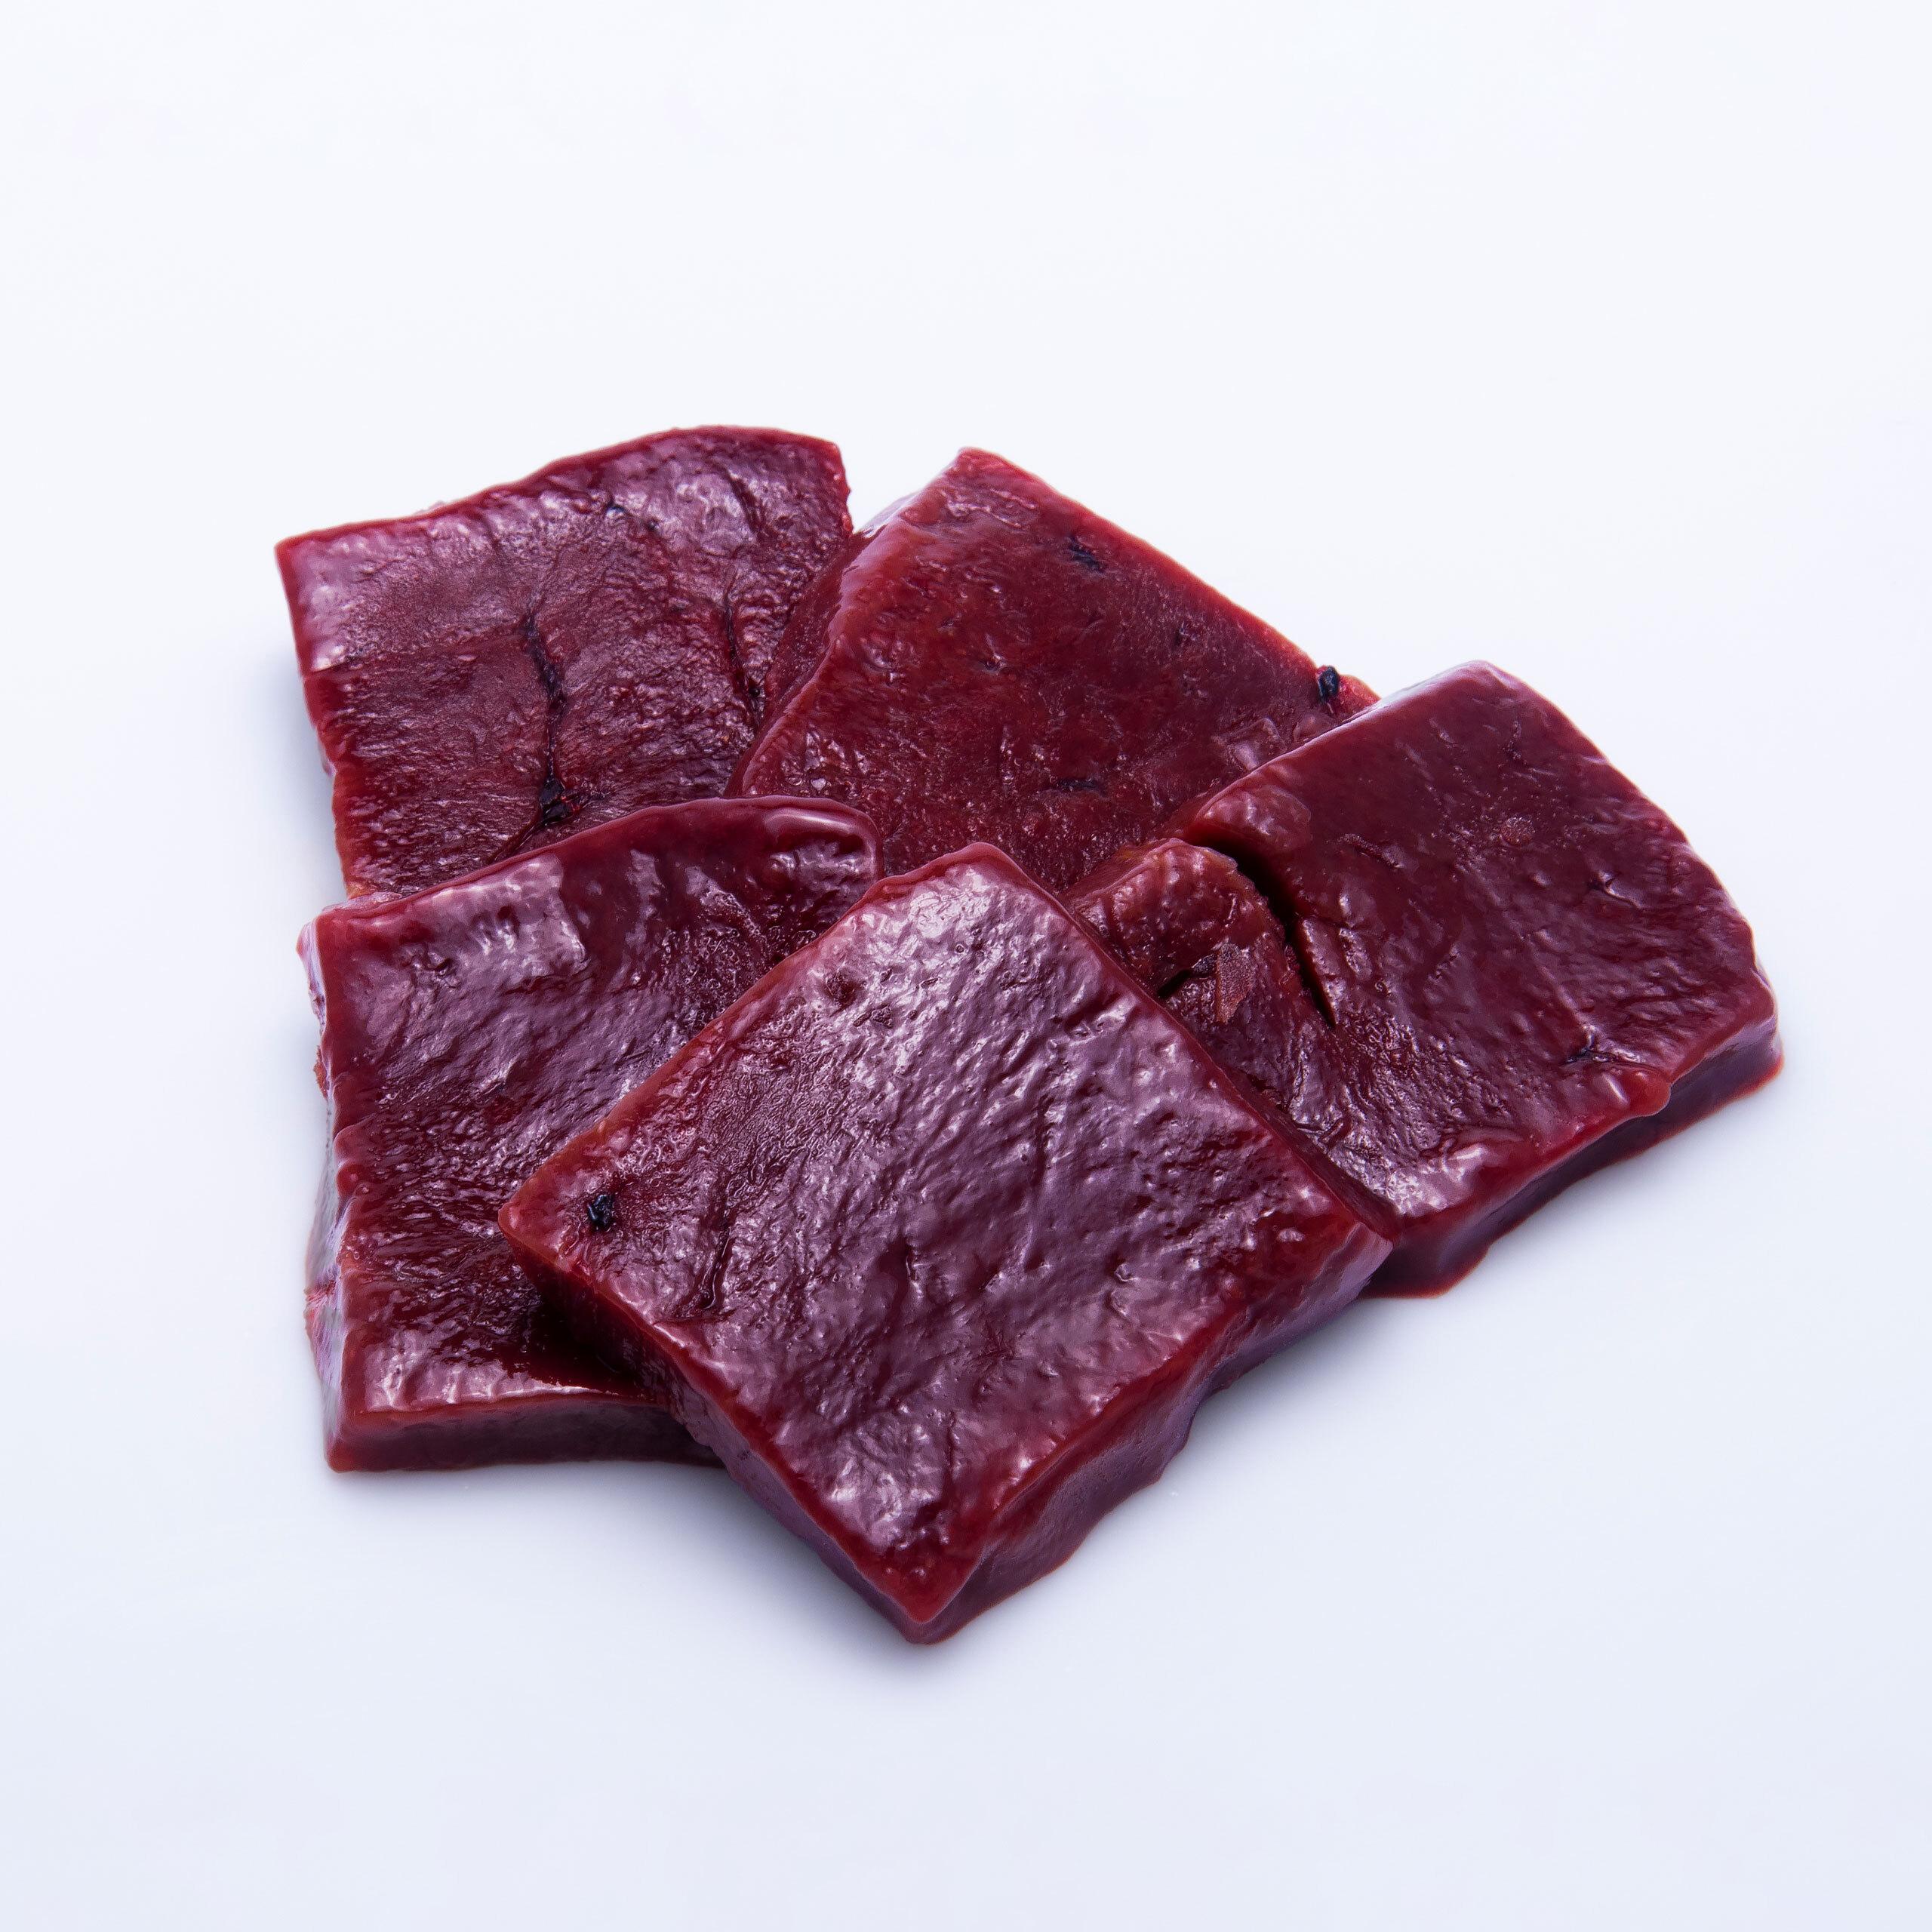 牛レバー|焼肉用:100g【国産】